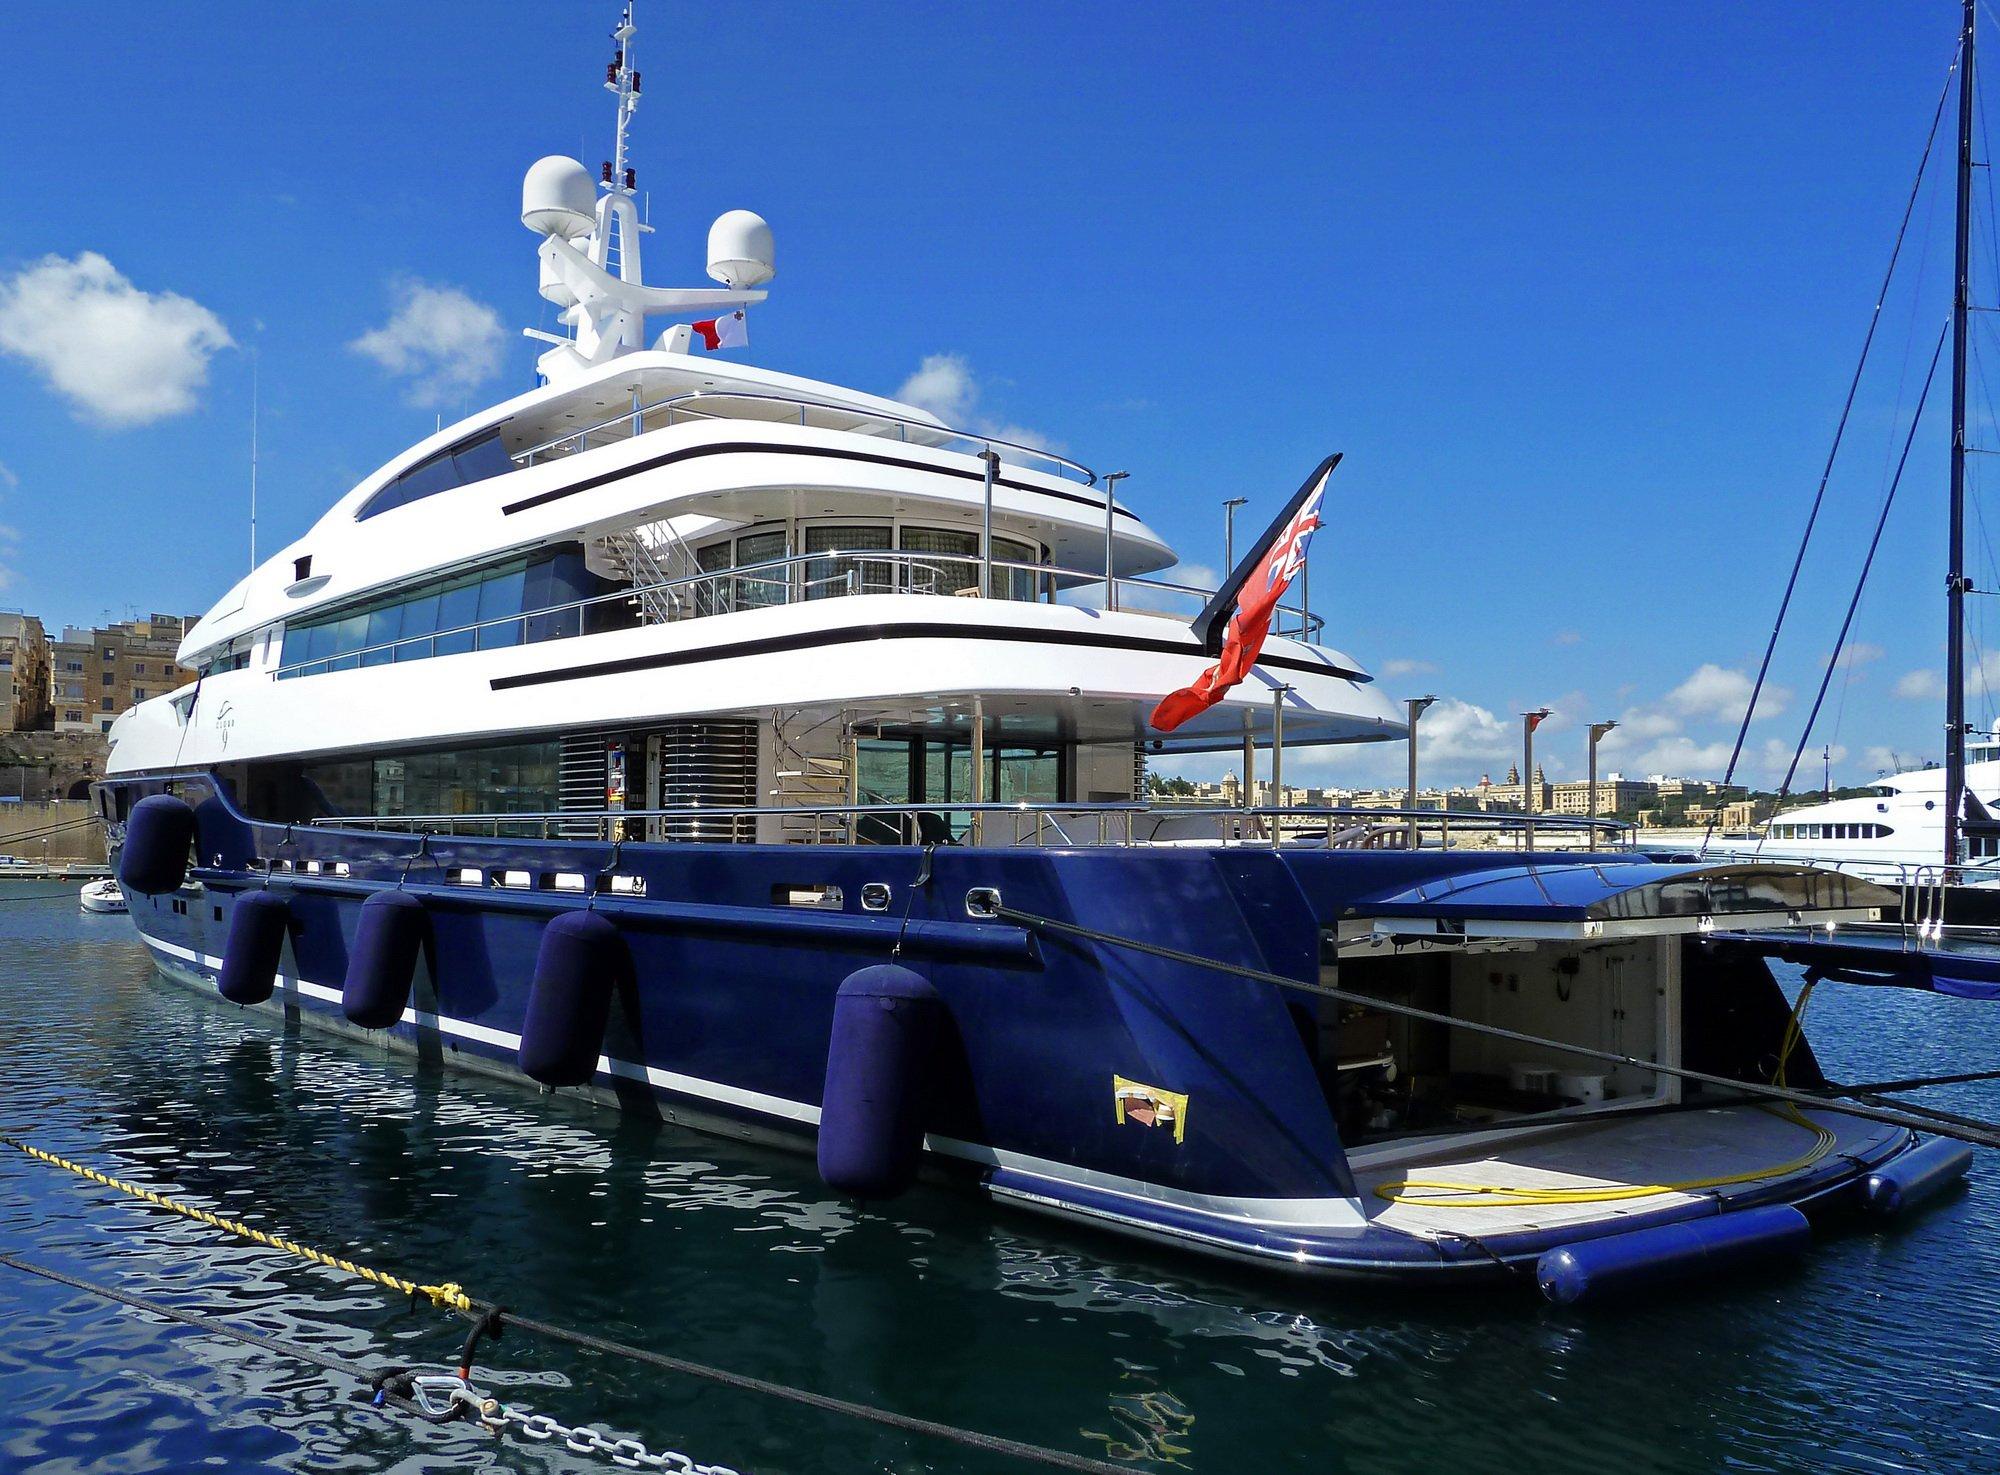 luxury super yacht wallpaper - photo #9